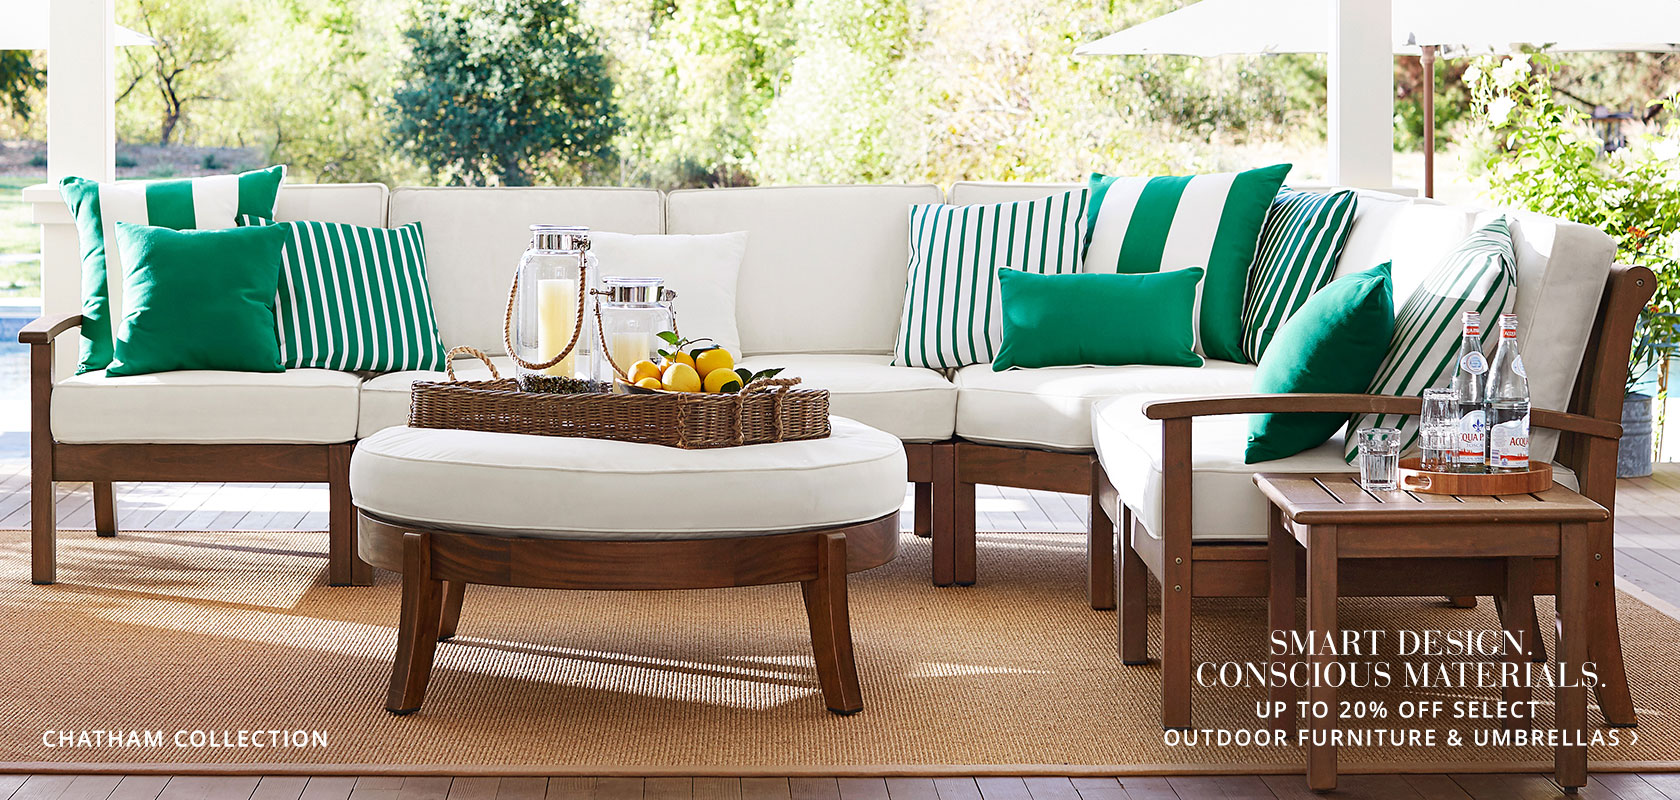 Home Furnishings, Home Decor, Outdoor Furniture & Modern ...